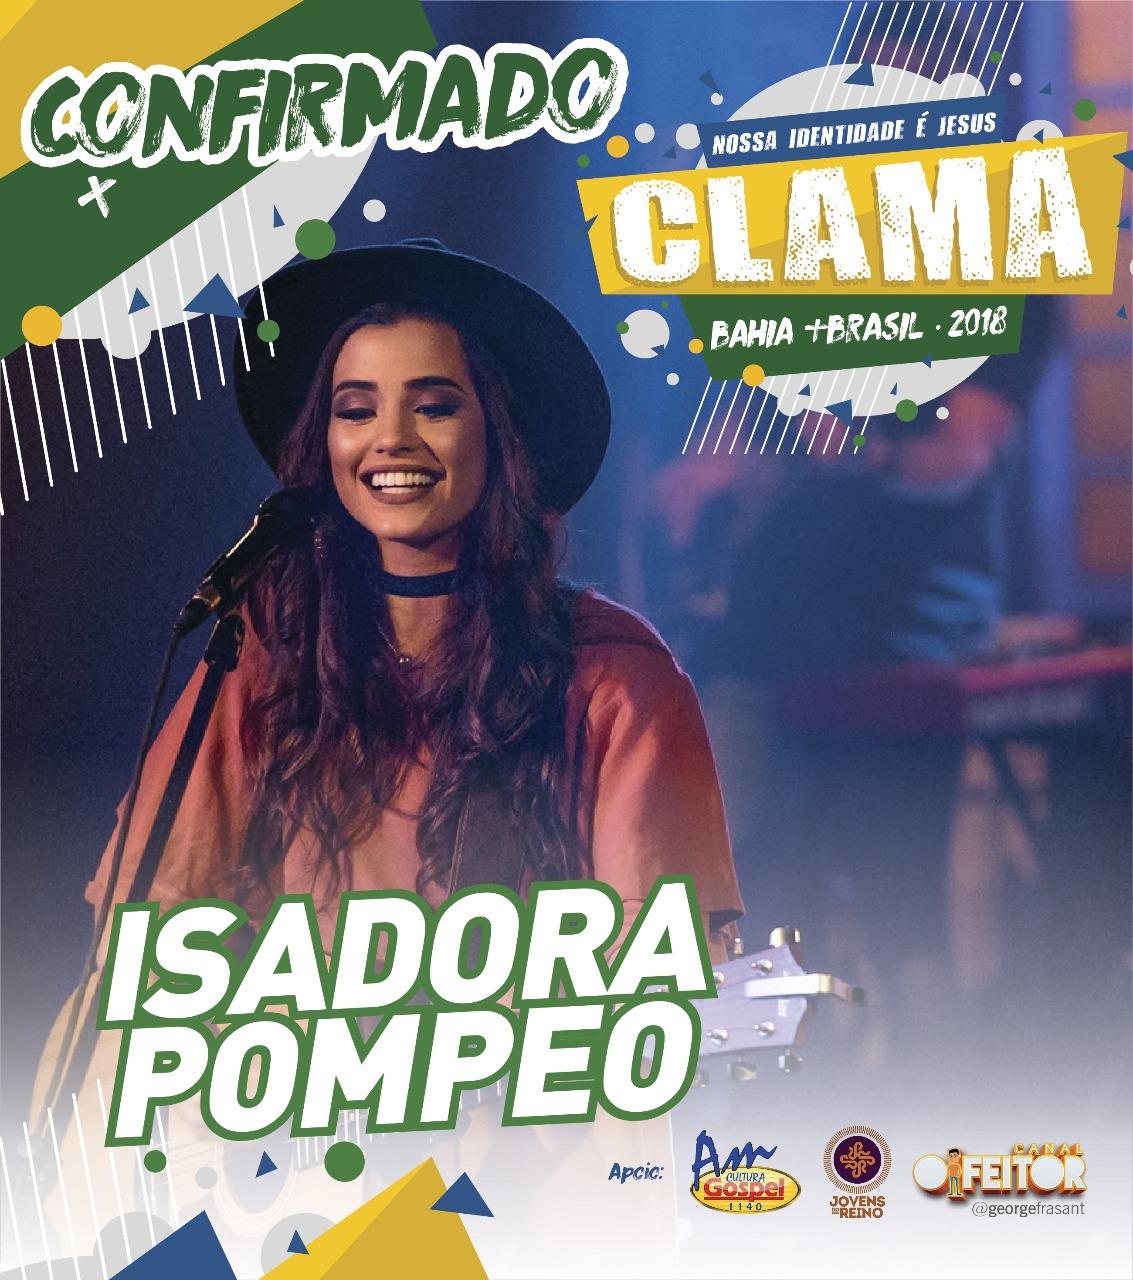 Fenômeno da Redes Sociais, Isadora Pompeo, estará presente no Clama Bahia  2018 55411fc092